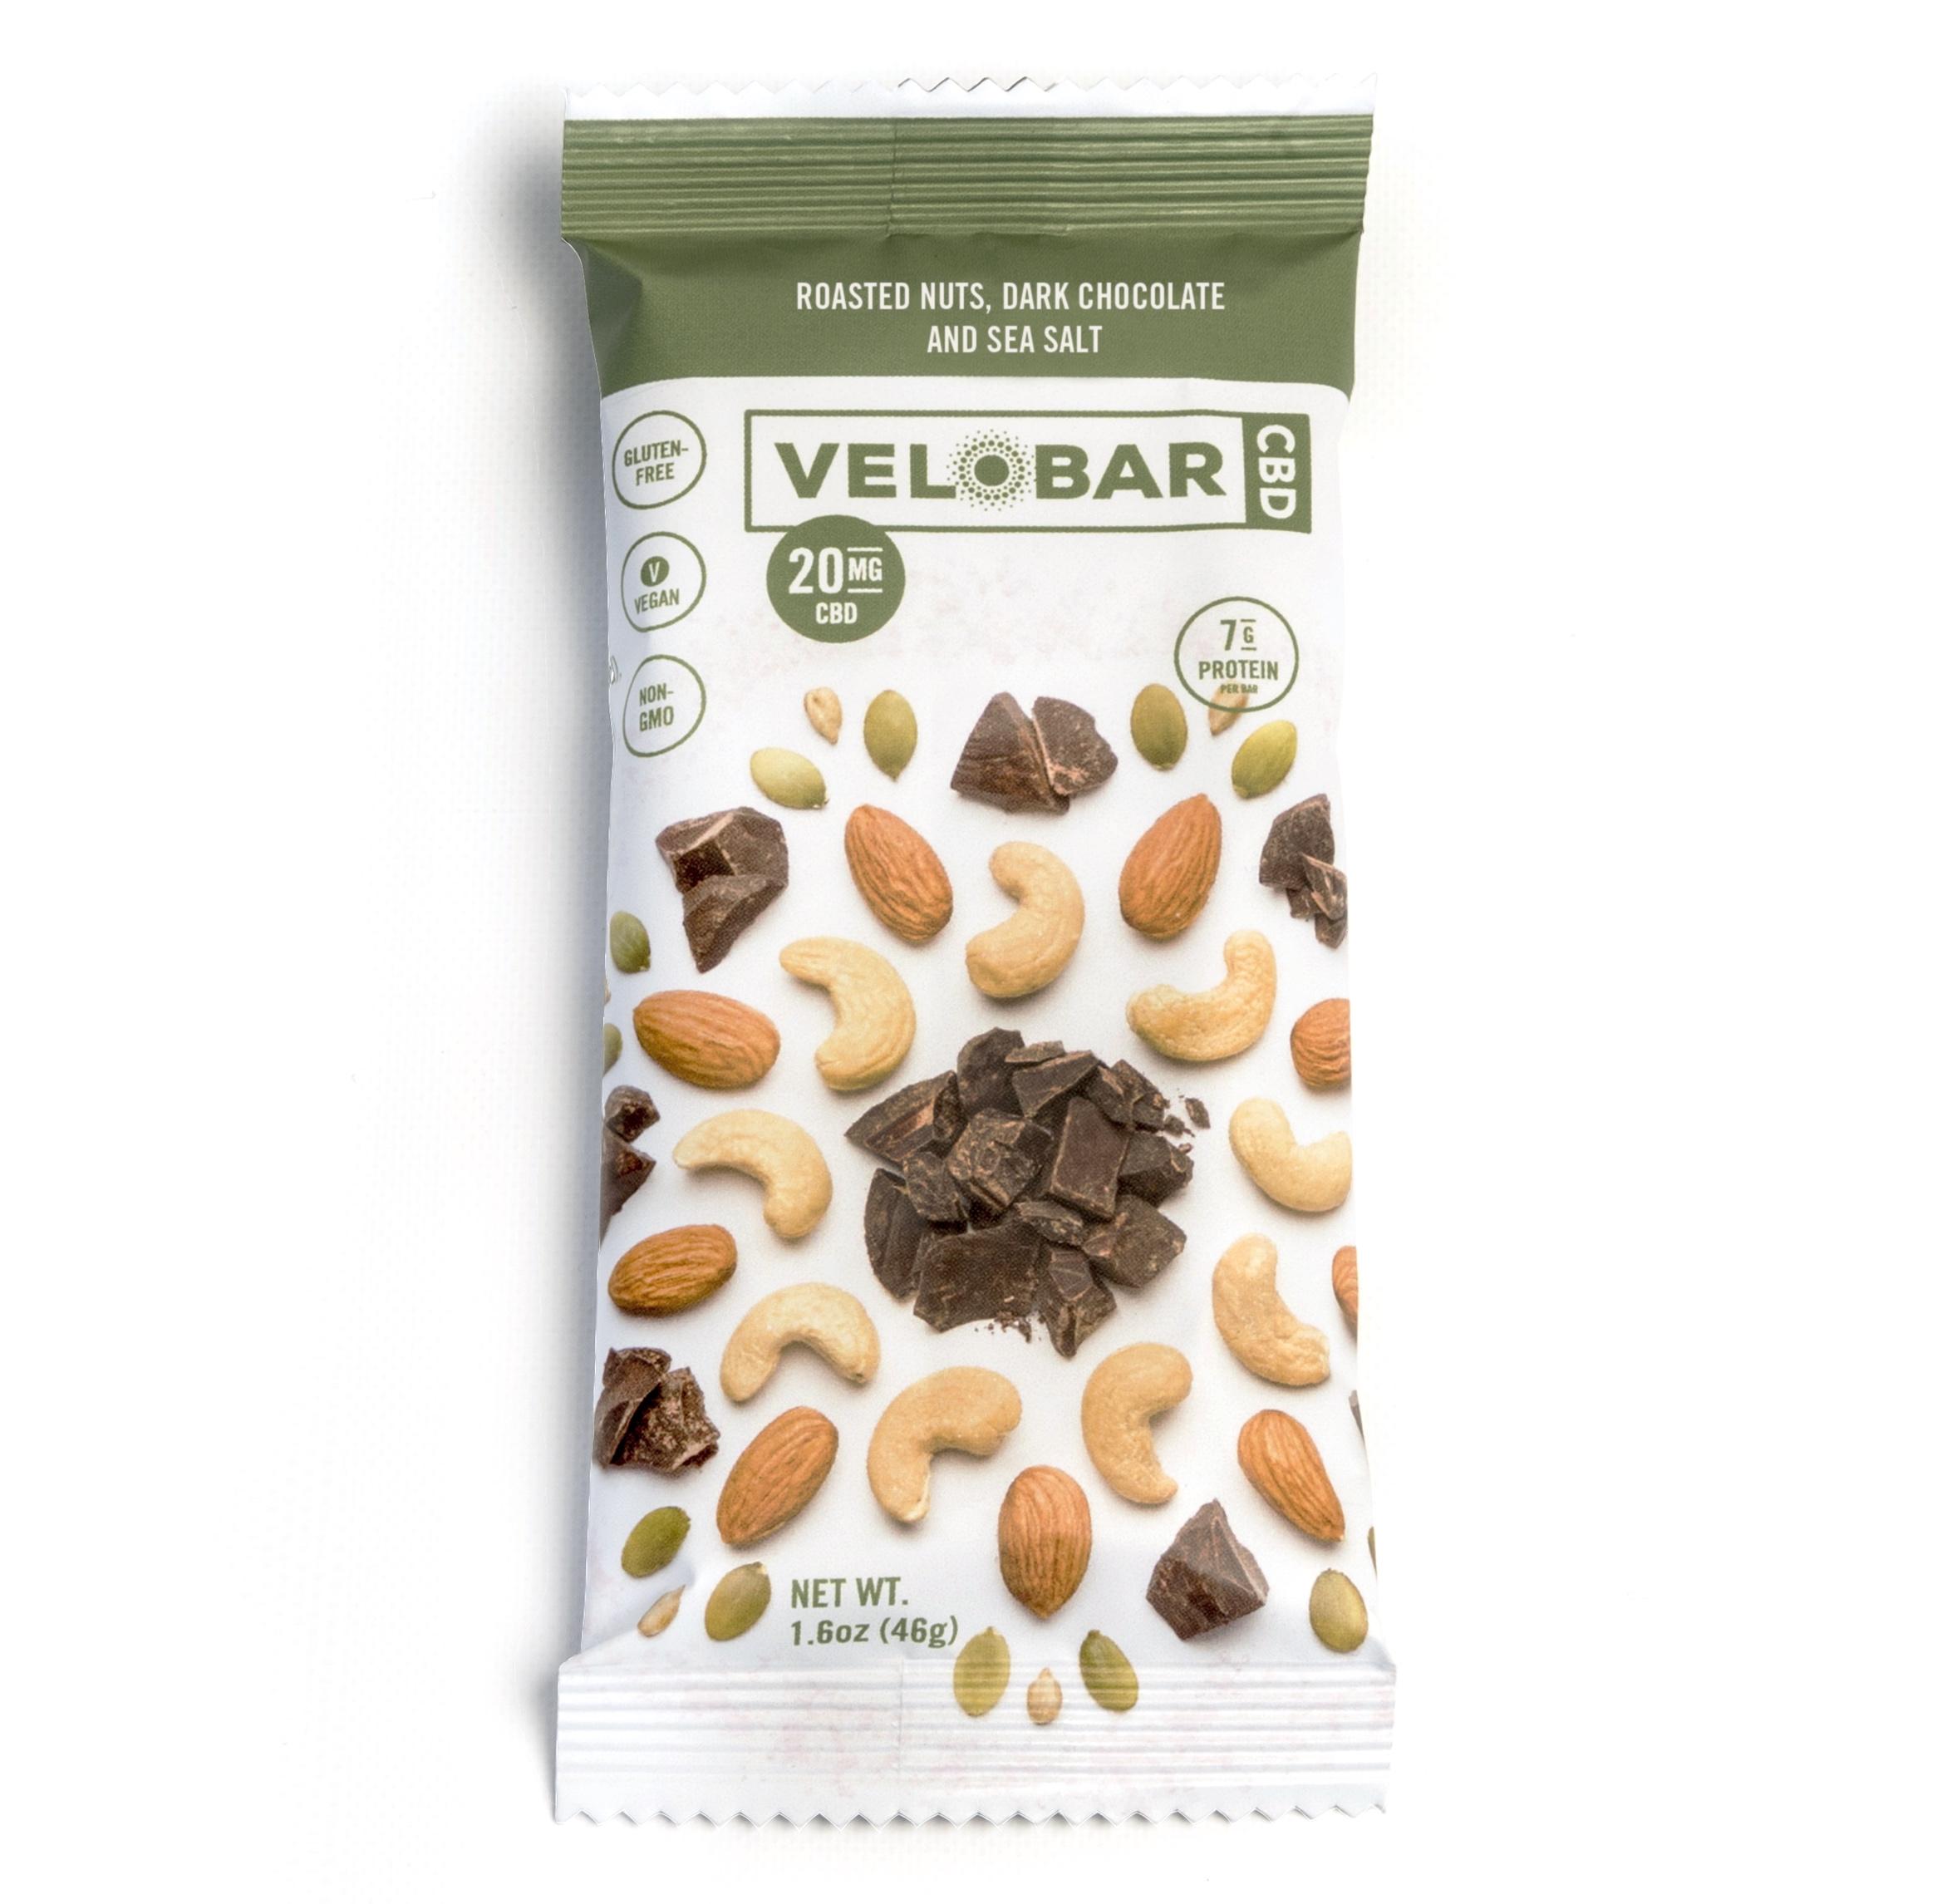 velobar-cbd-single.jpg